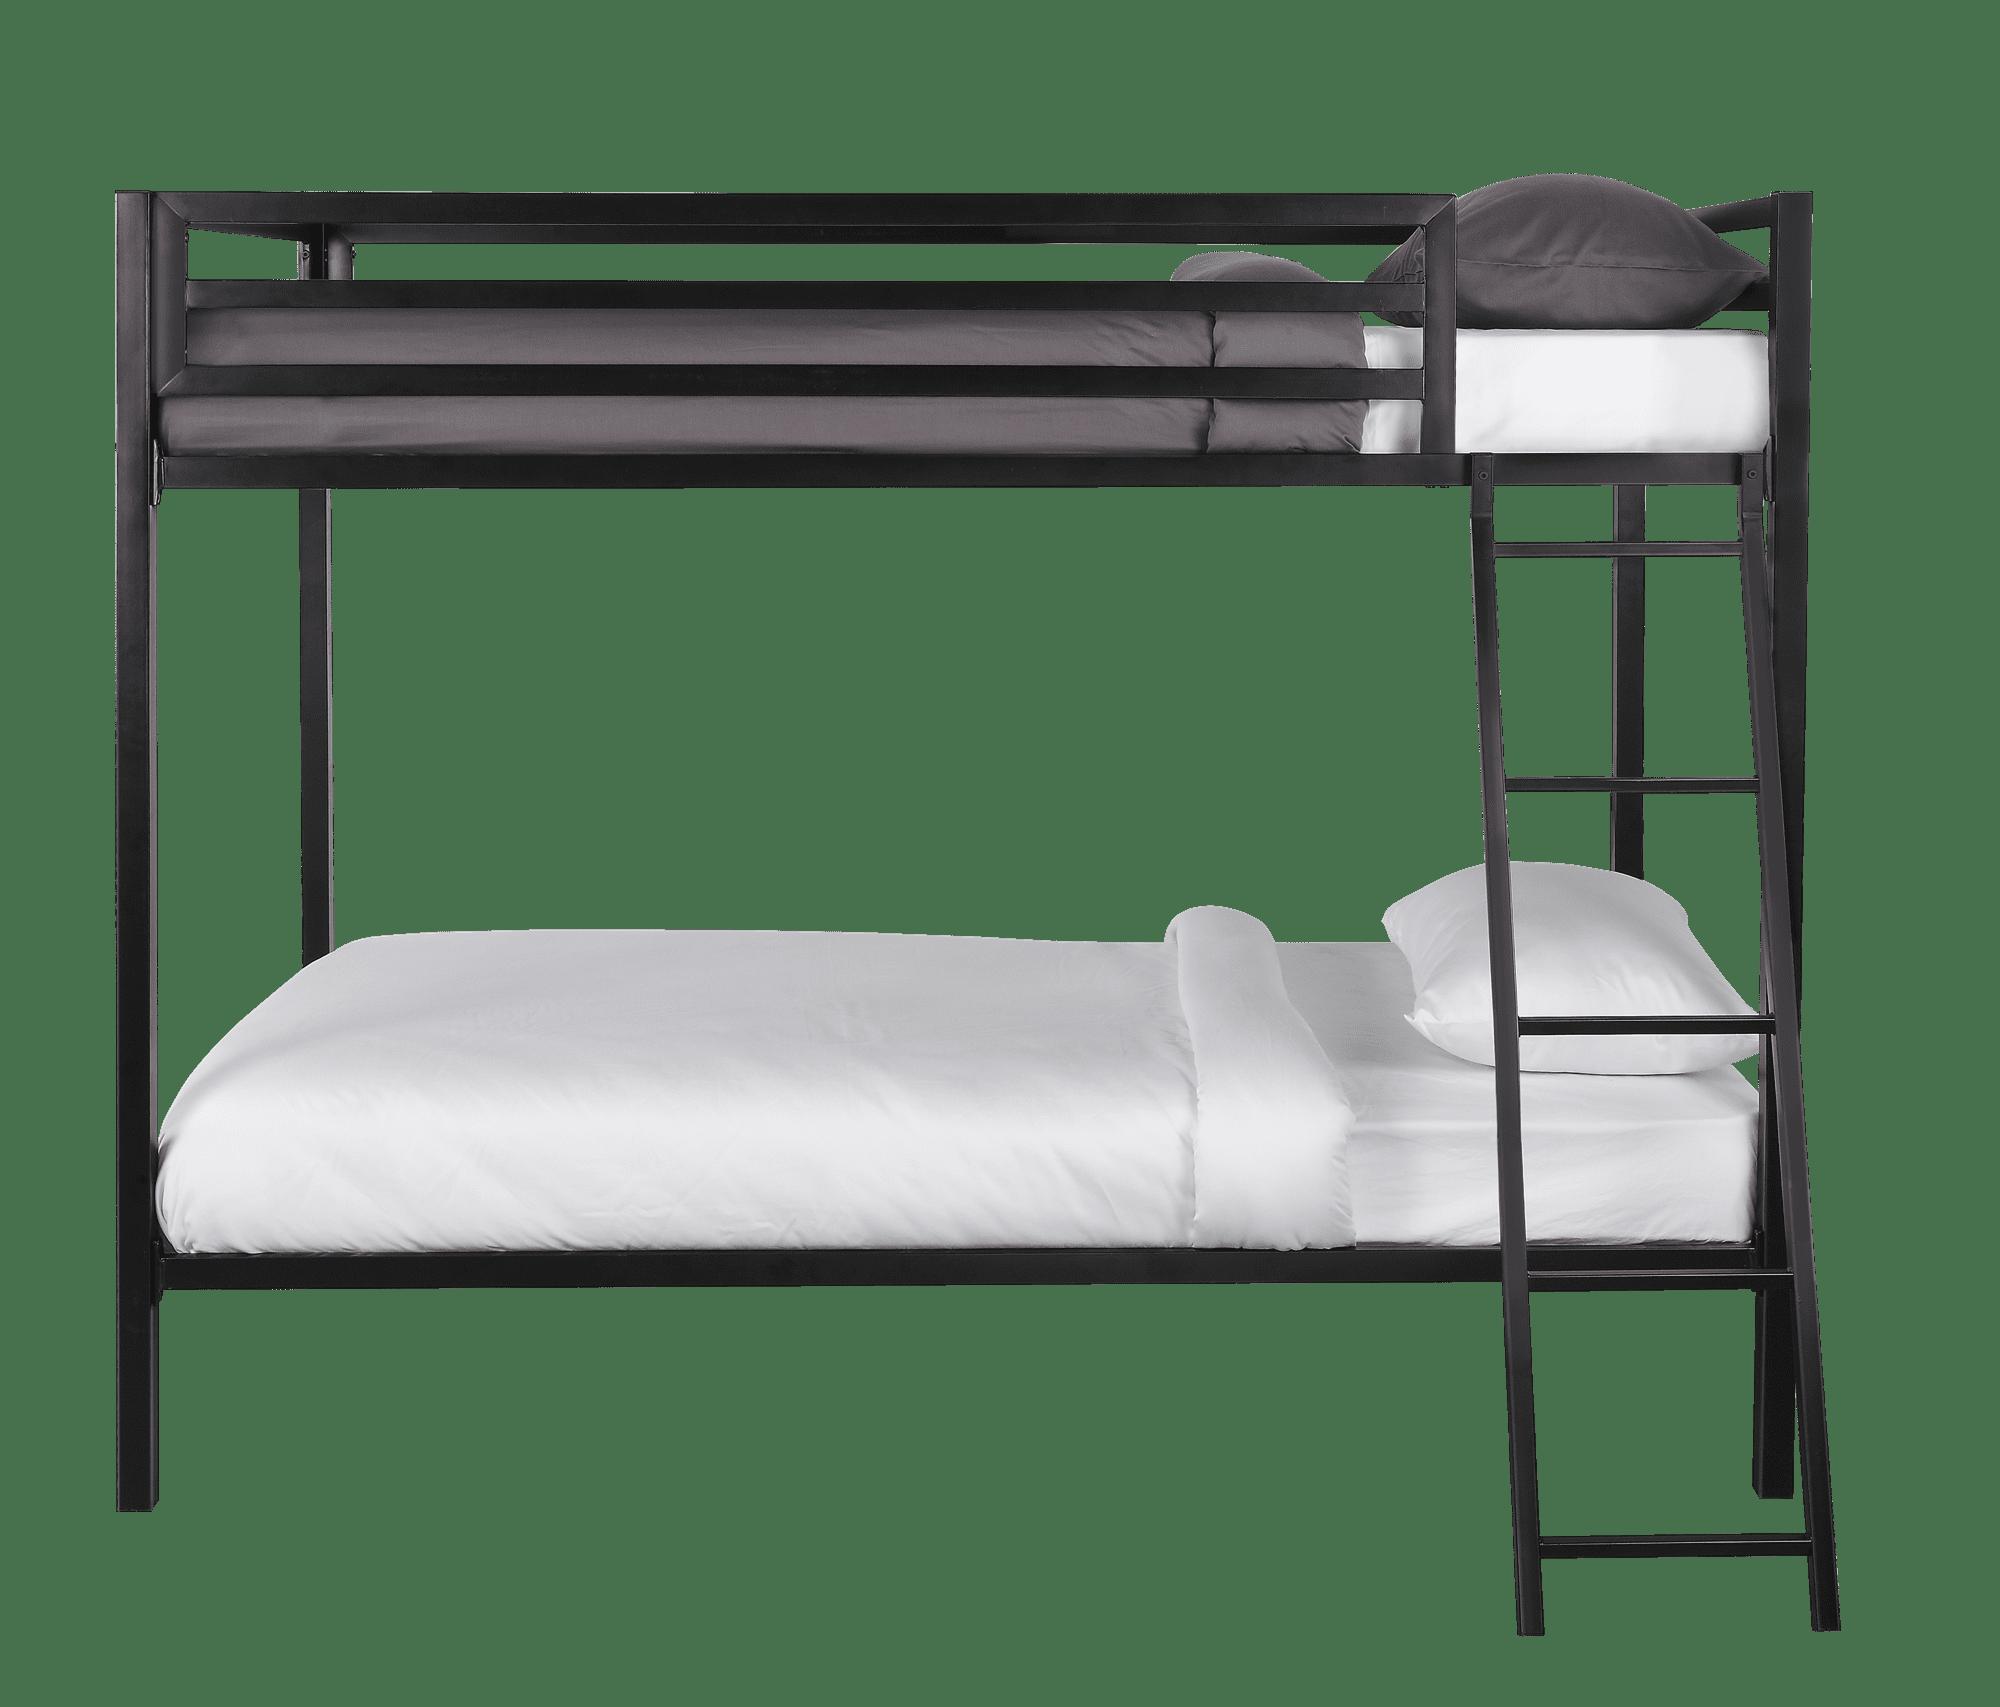 Mainstays Premium Metal Twin Over Twin Bunk Bed Multiple Colors Walmart Com Walmart Com